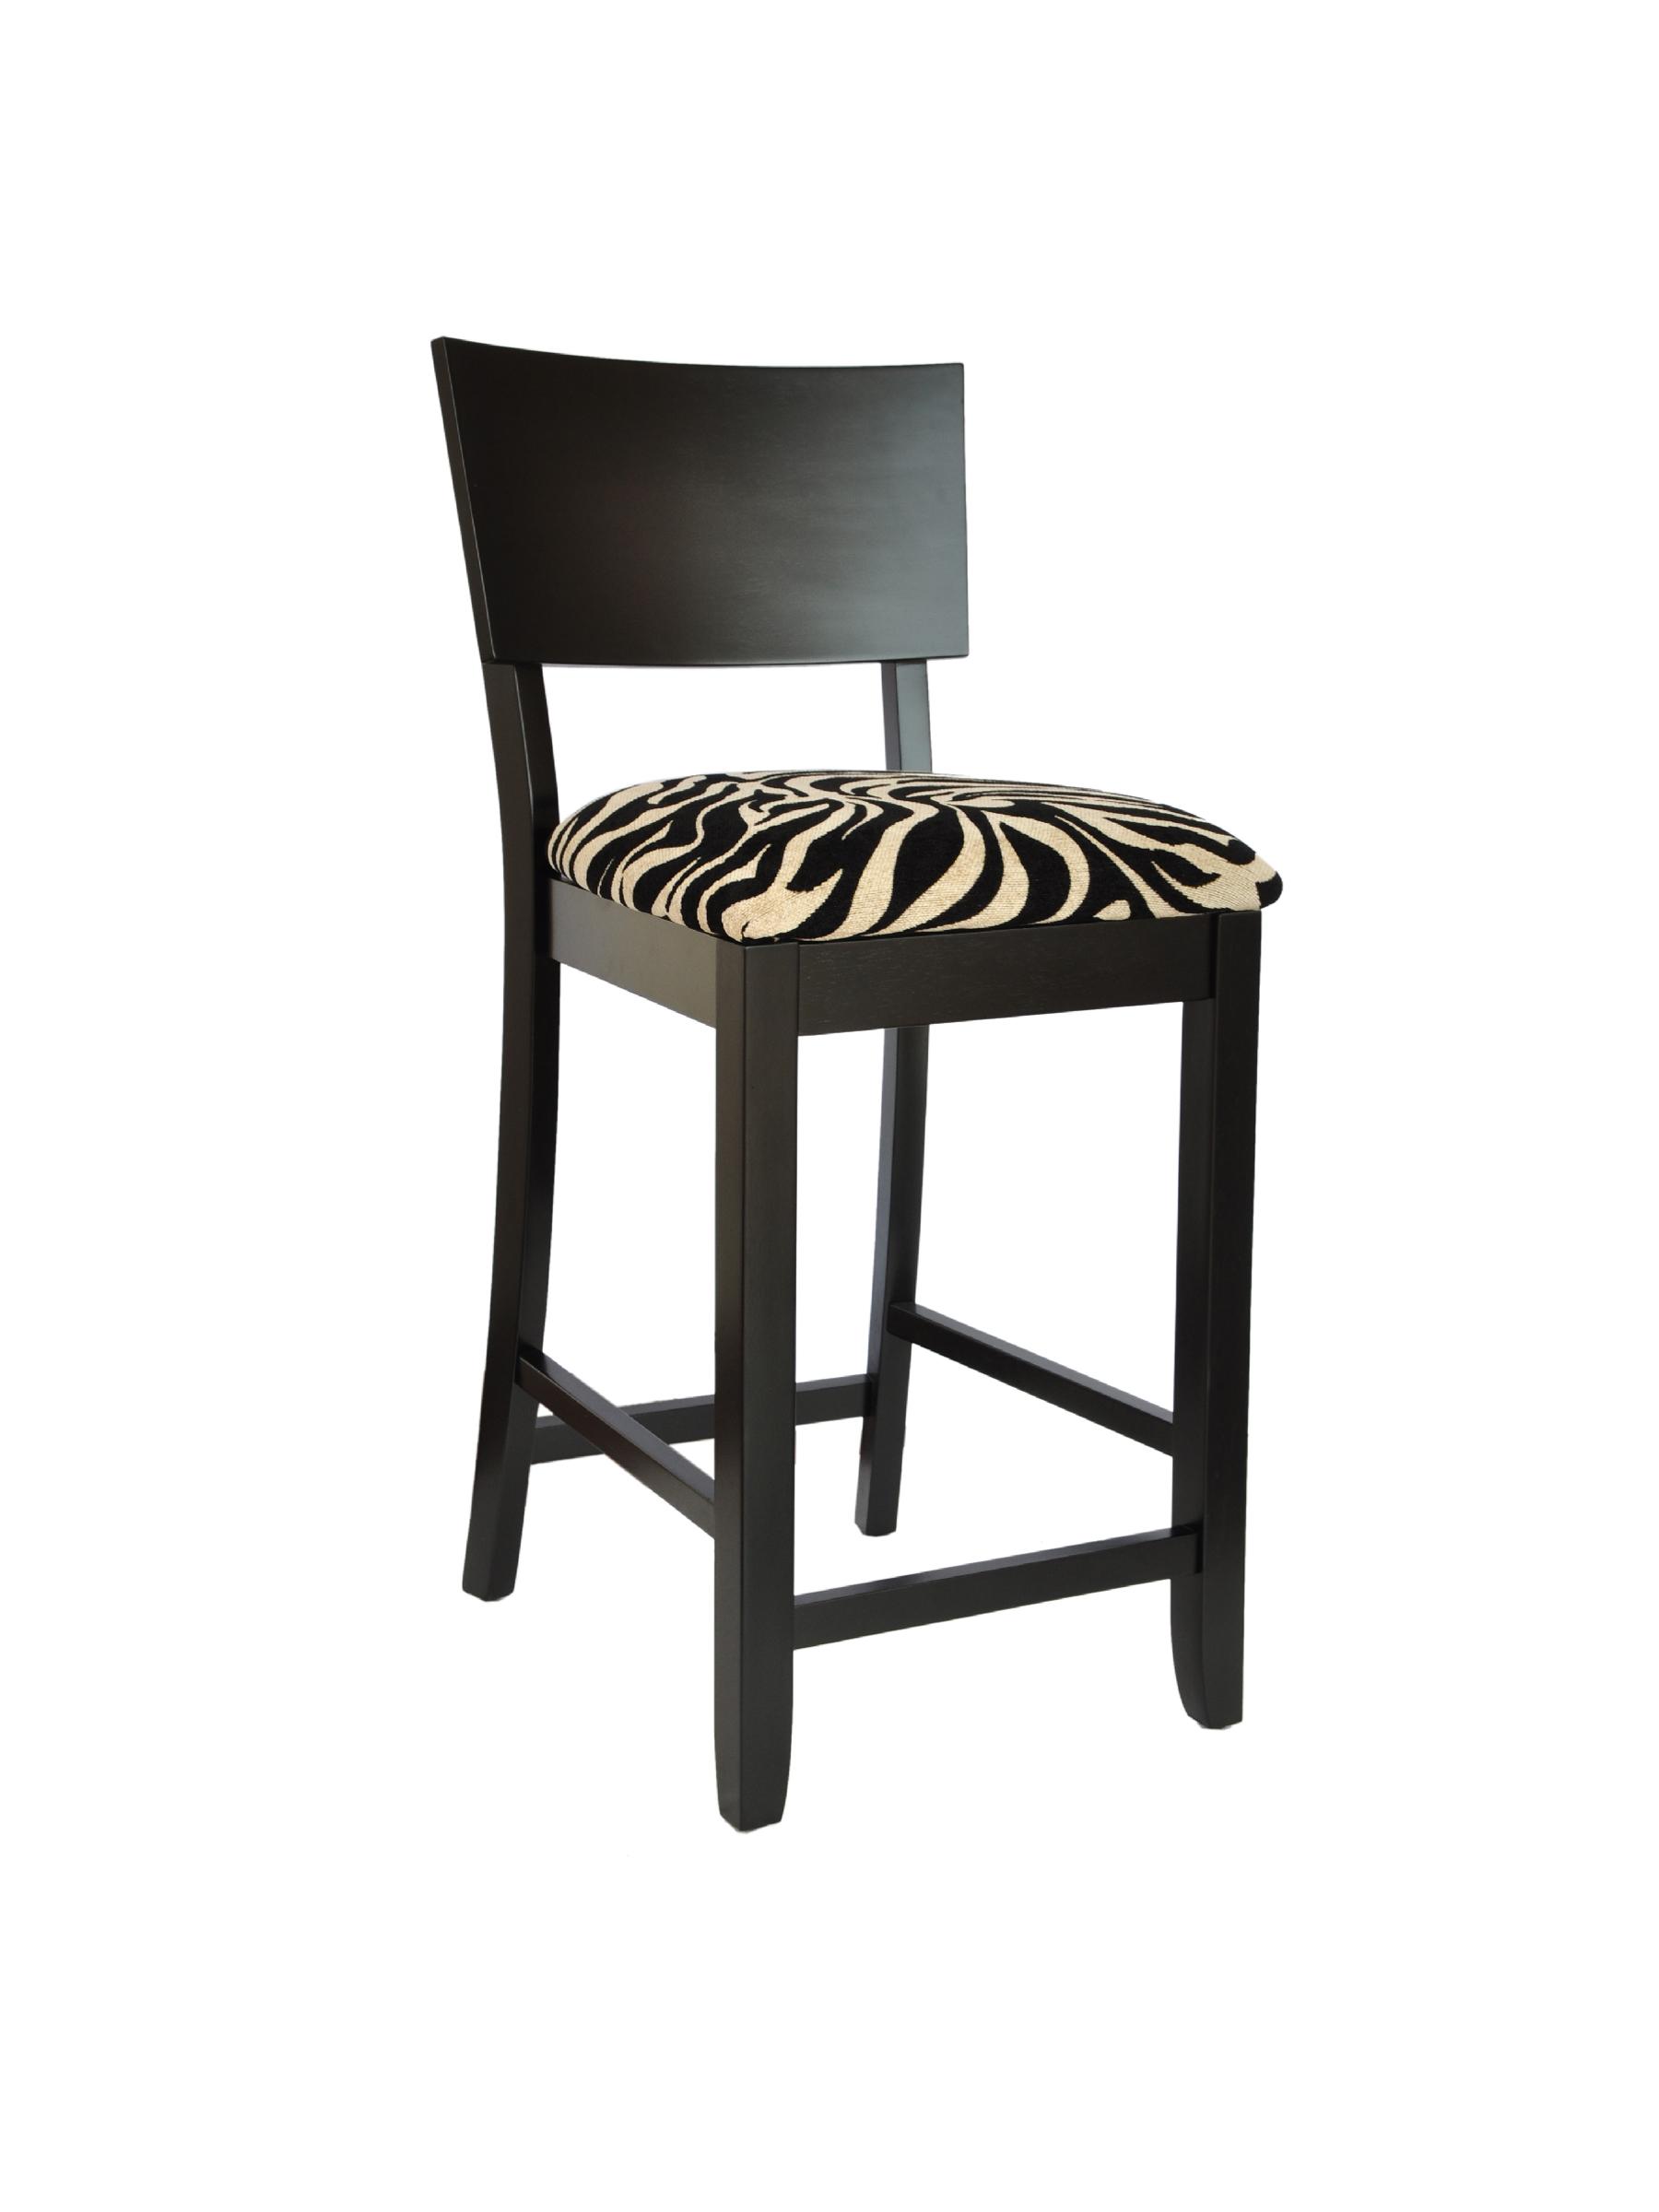 Kitchen stool chairs Photo - 4